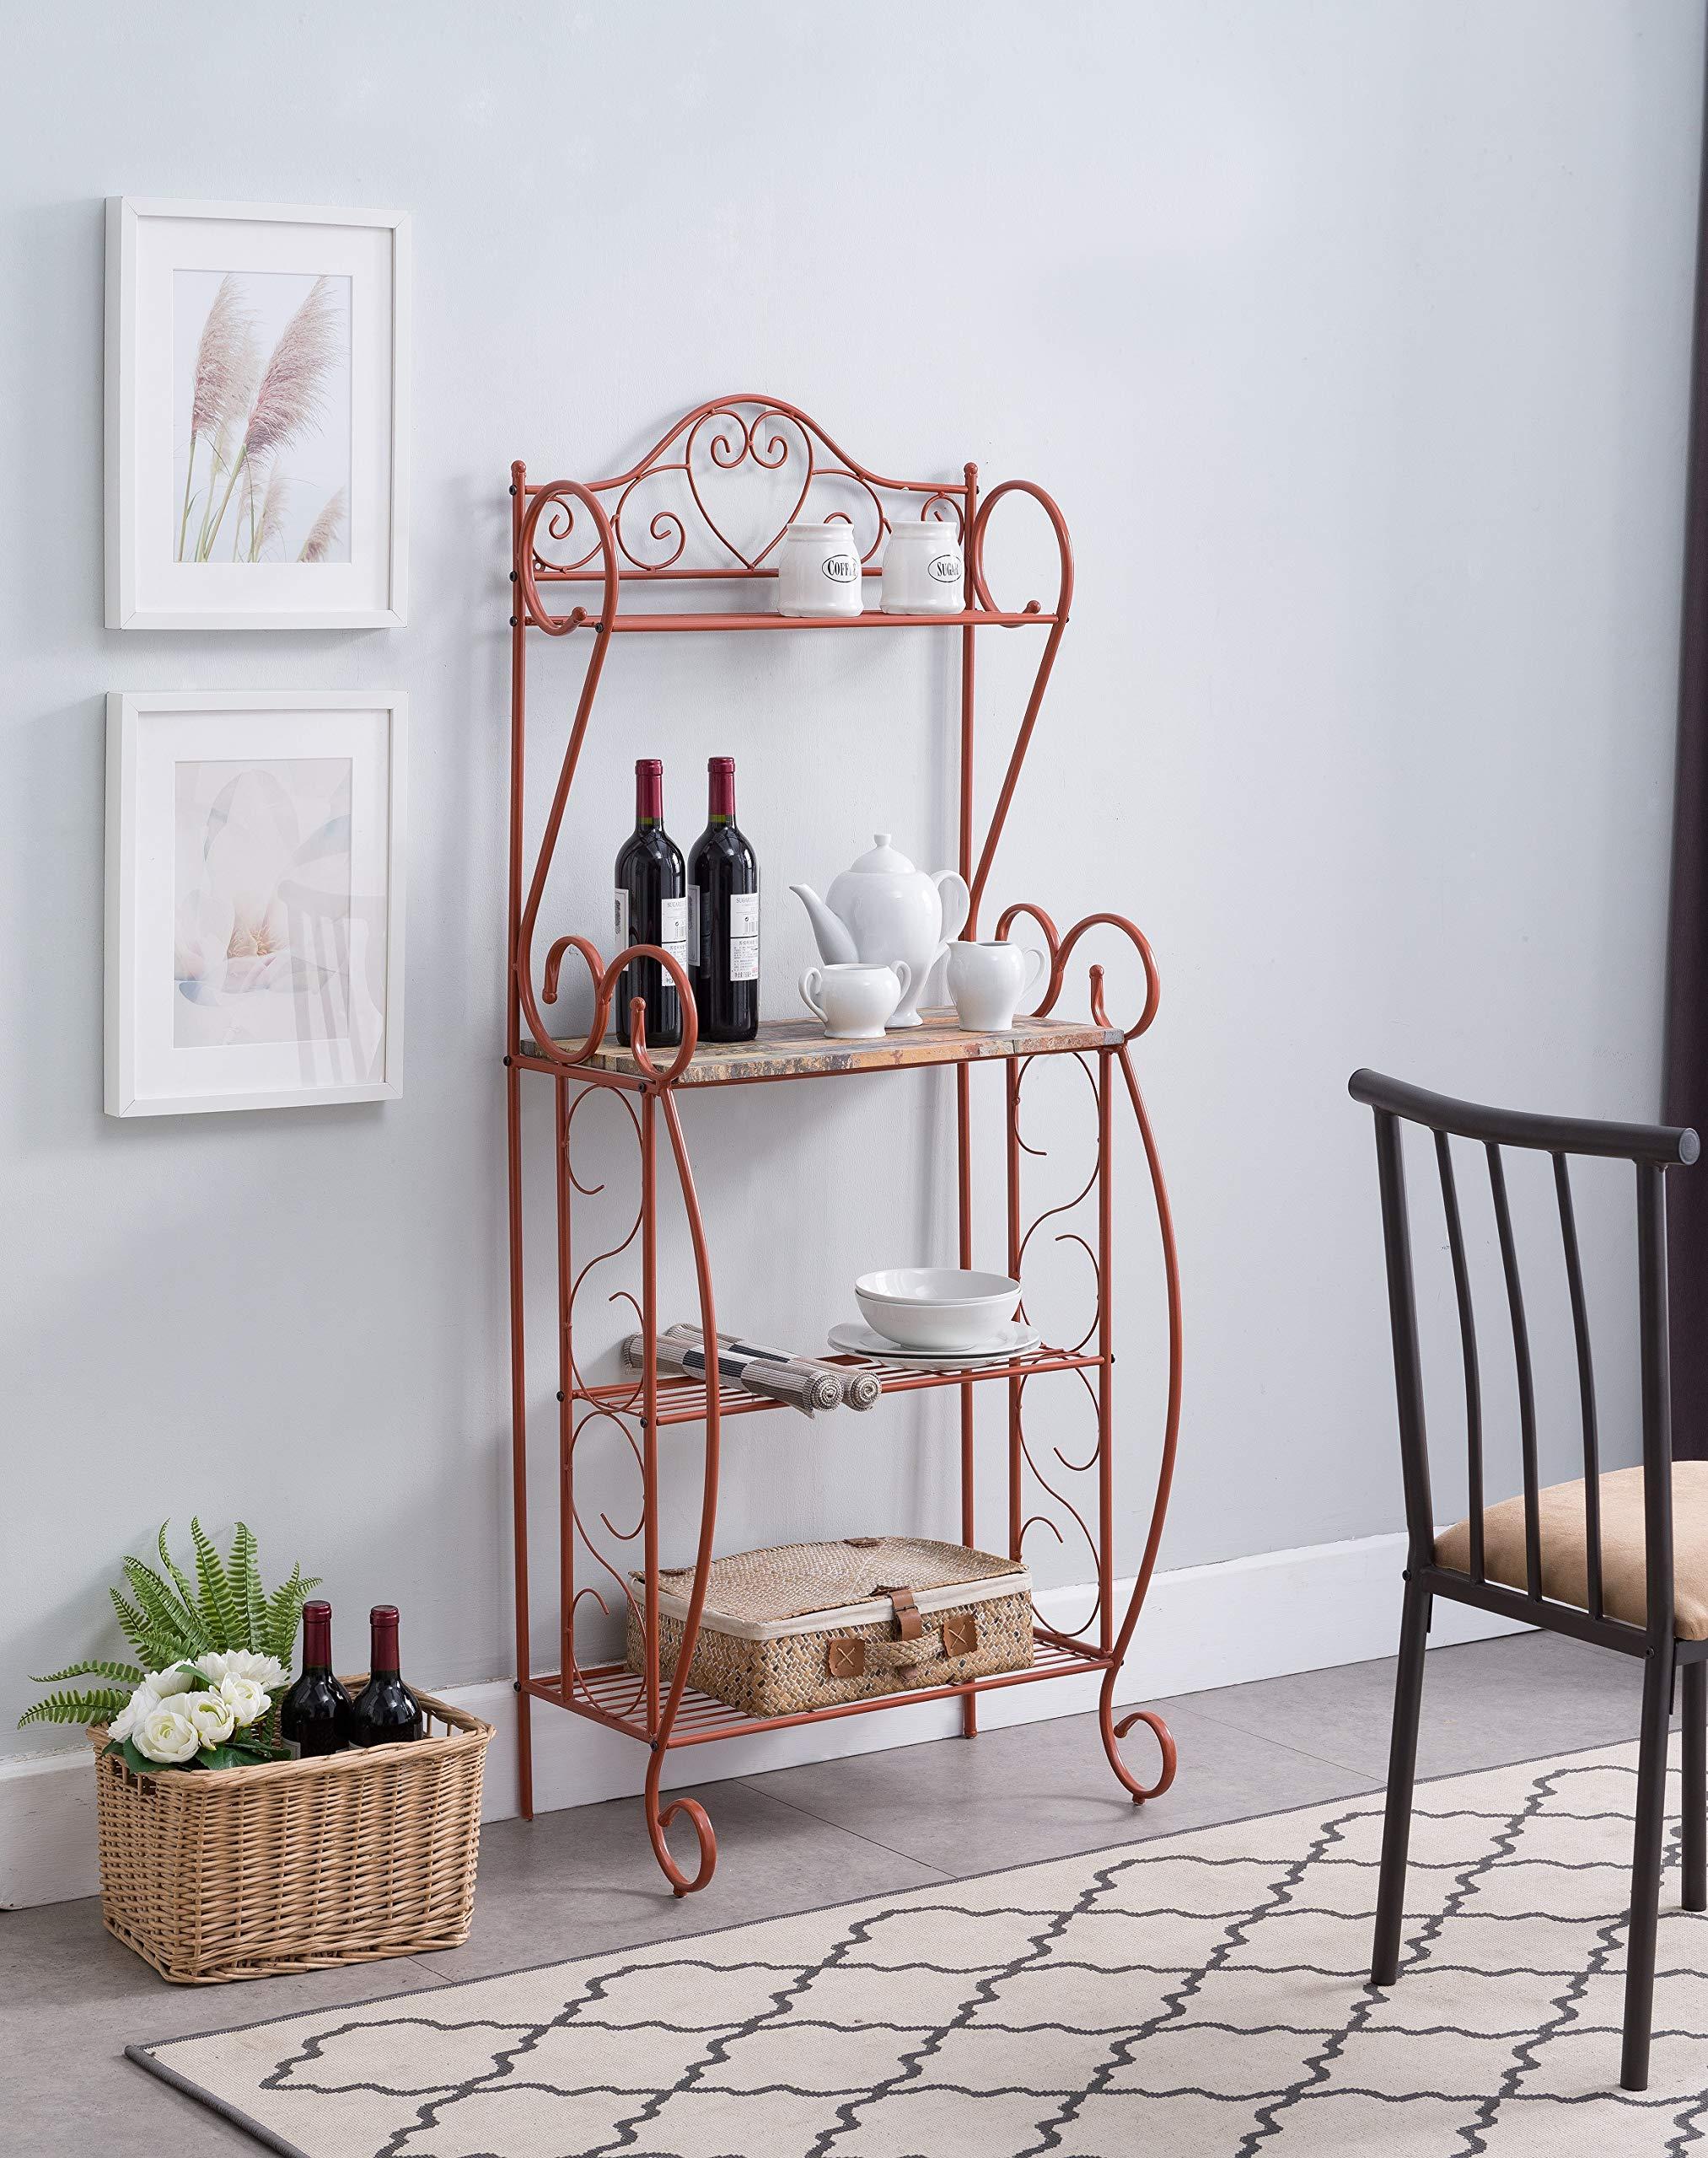 Kings Brand Furniture - Sparta Metal Kitchen Storage Bakers Rack, Orange